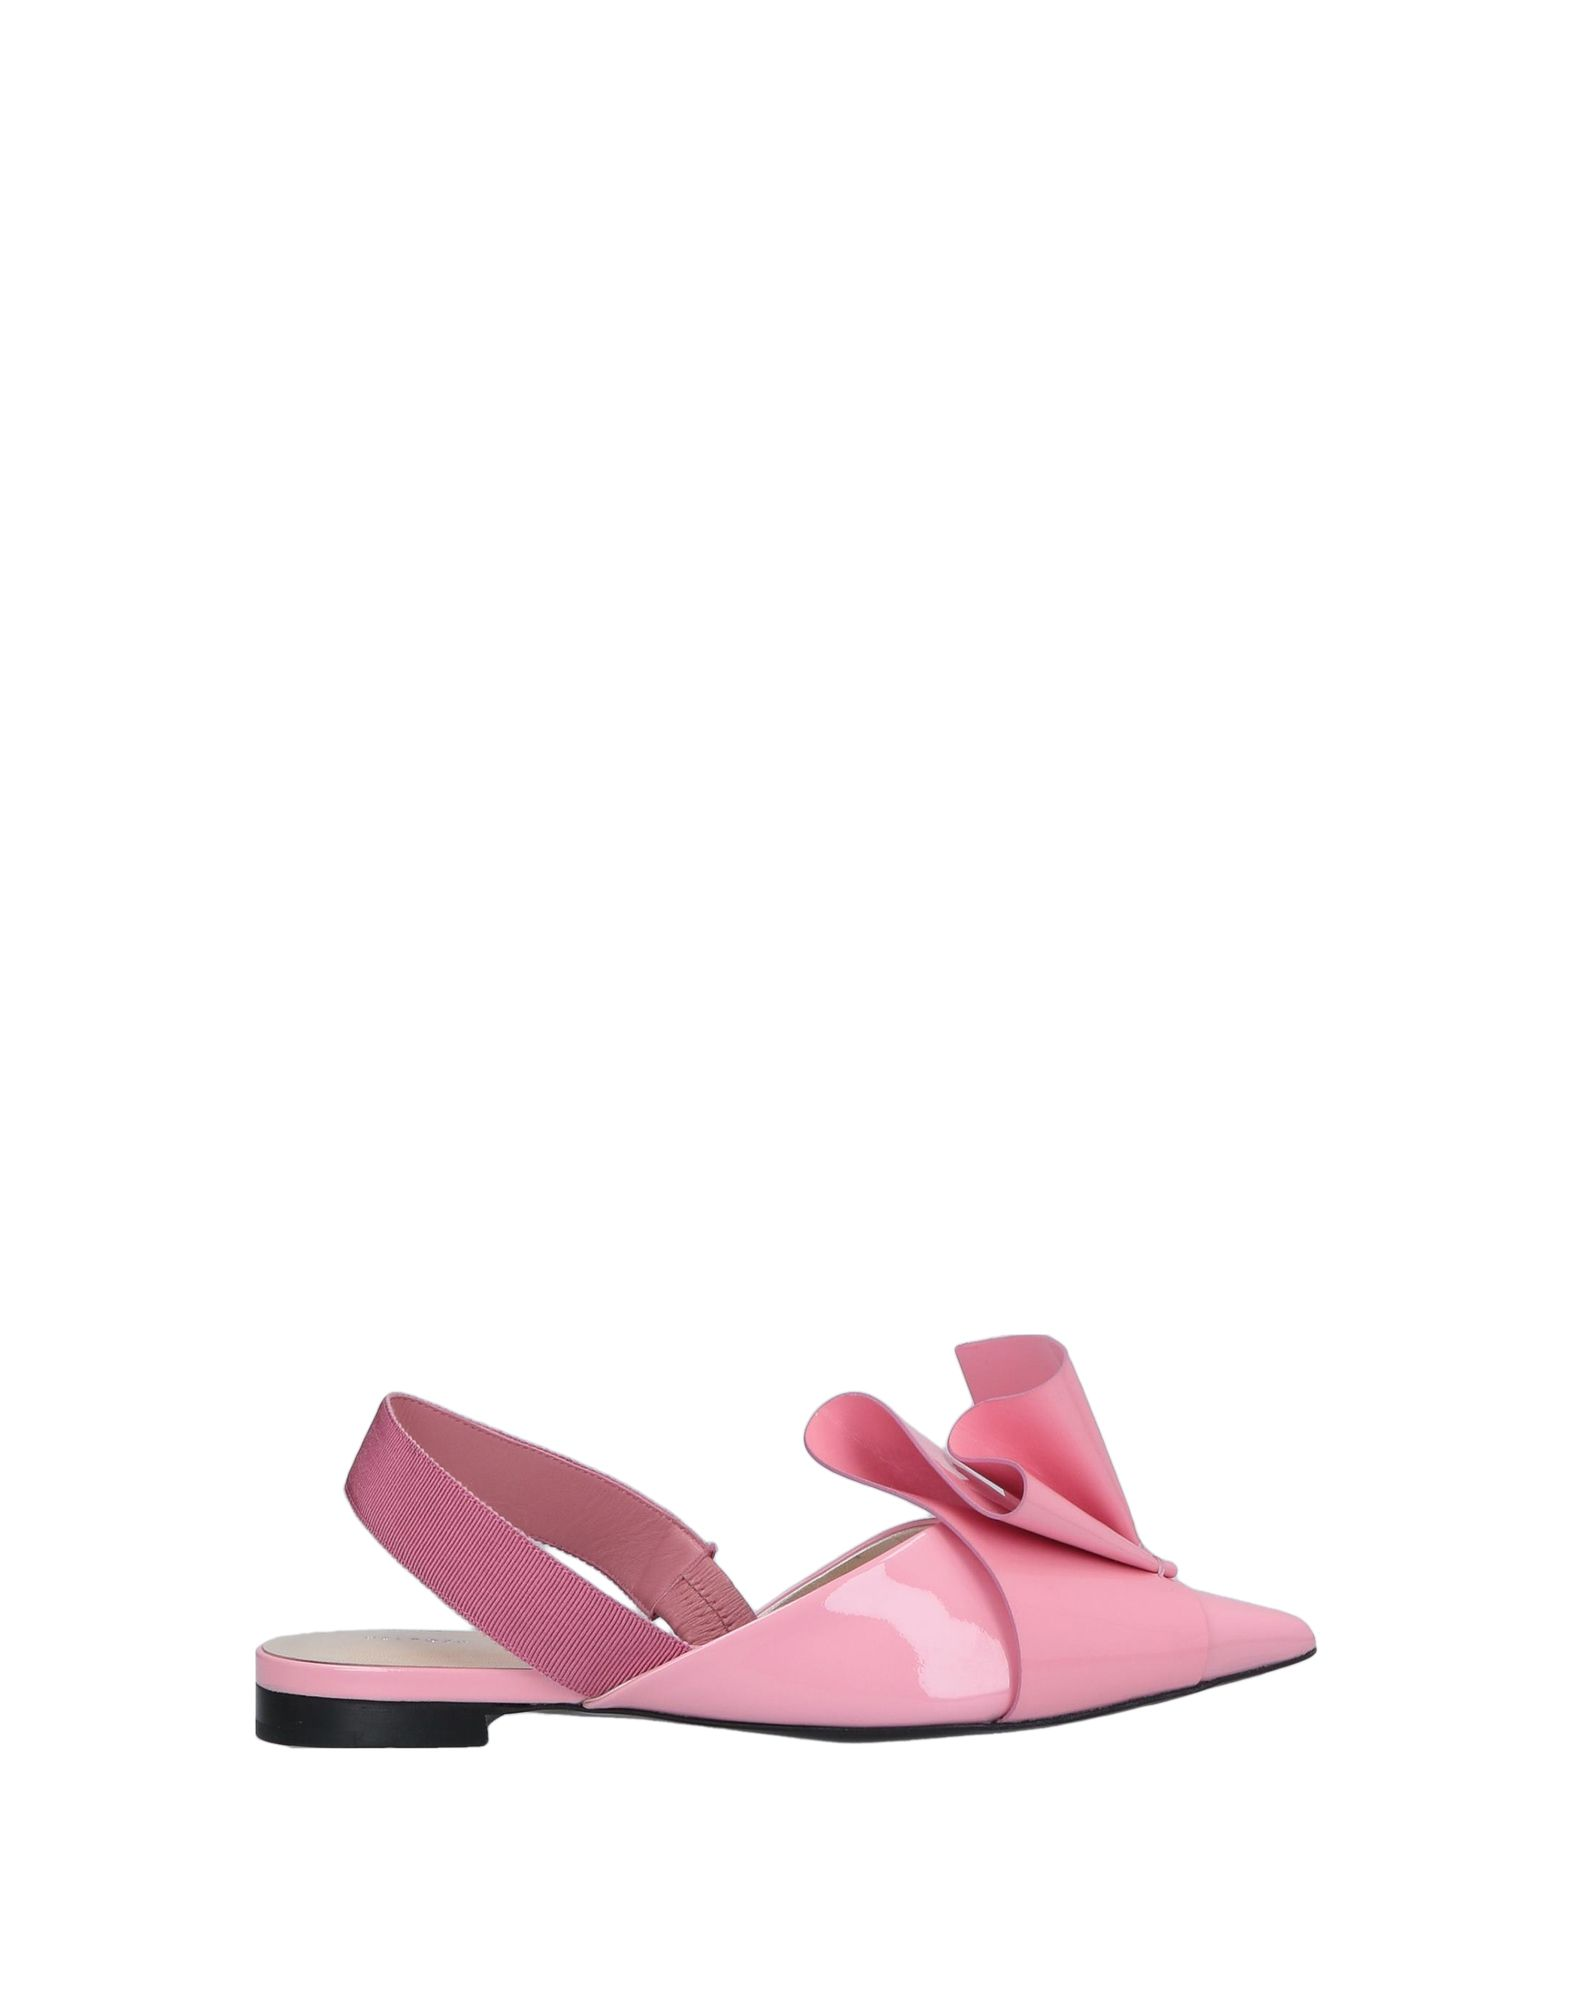 DELPOZO | DELPOZO Ballet Flats 11691483 | Goxip